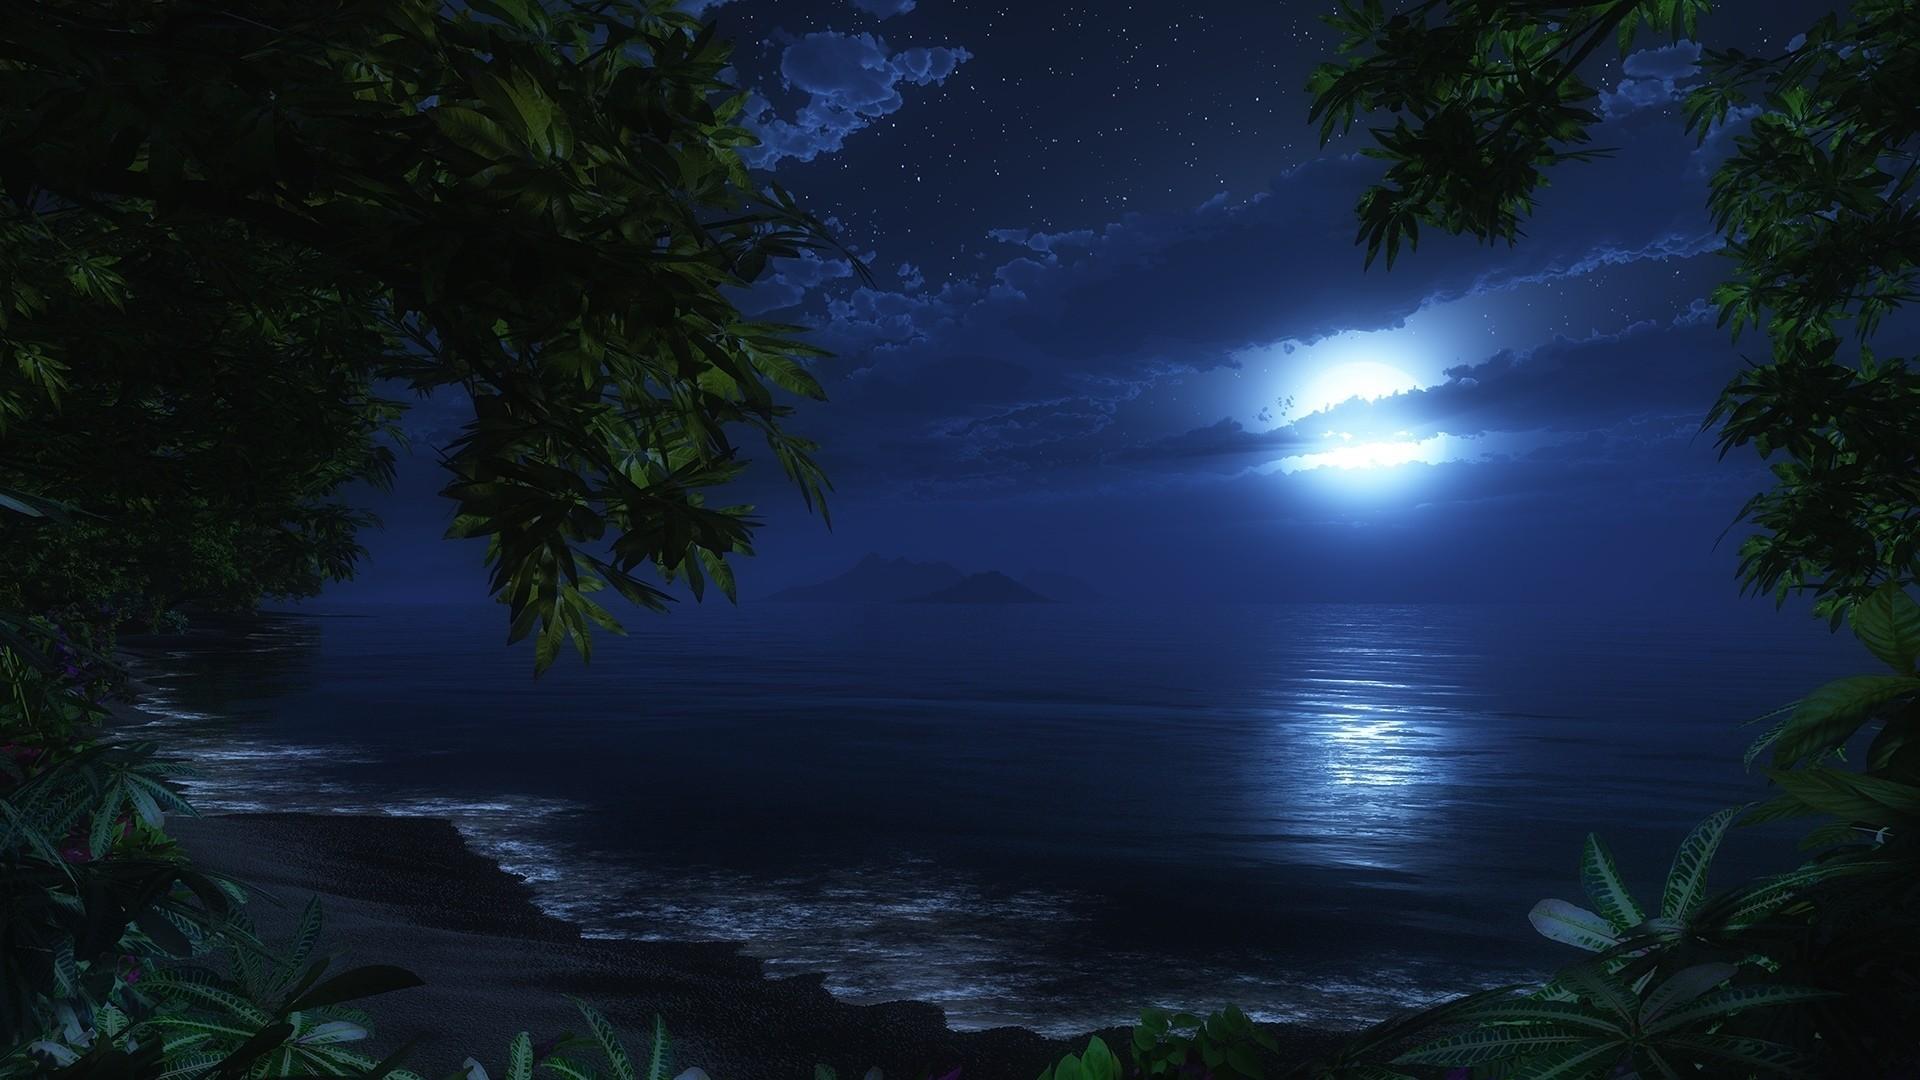 Cg Digital Art Nature Ocean Beaches Waves Sky Night Trees Tropical Jungle  Wallpaper At 3d Wallpapers